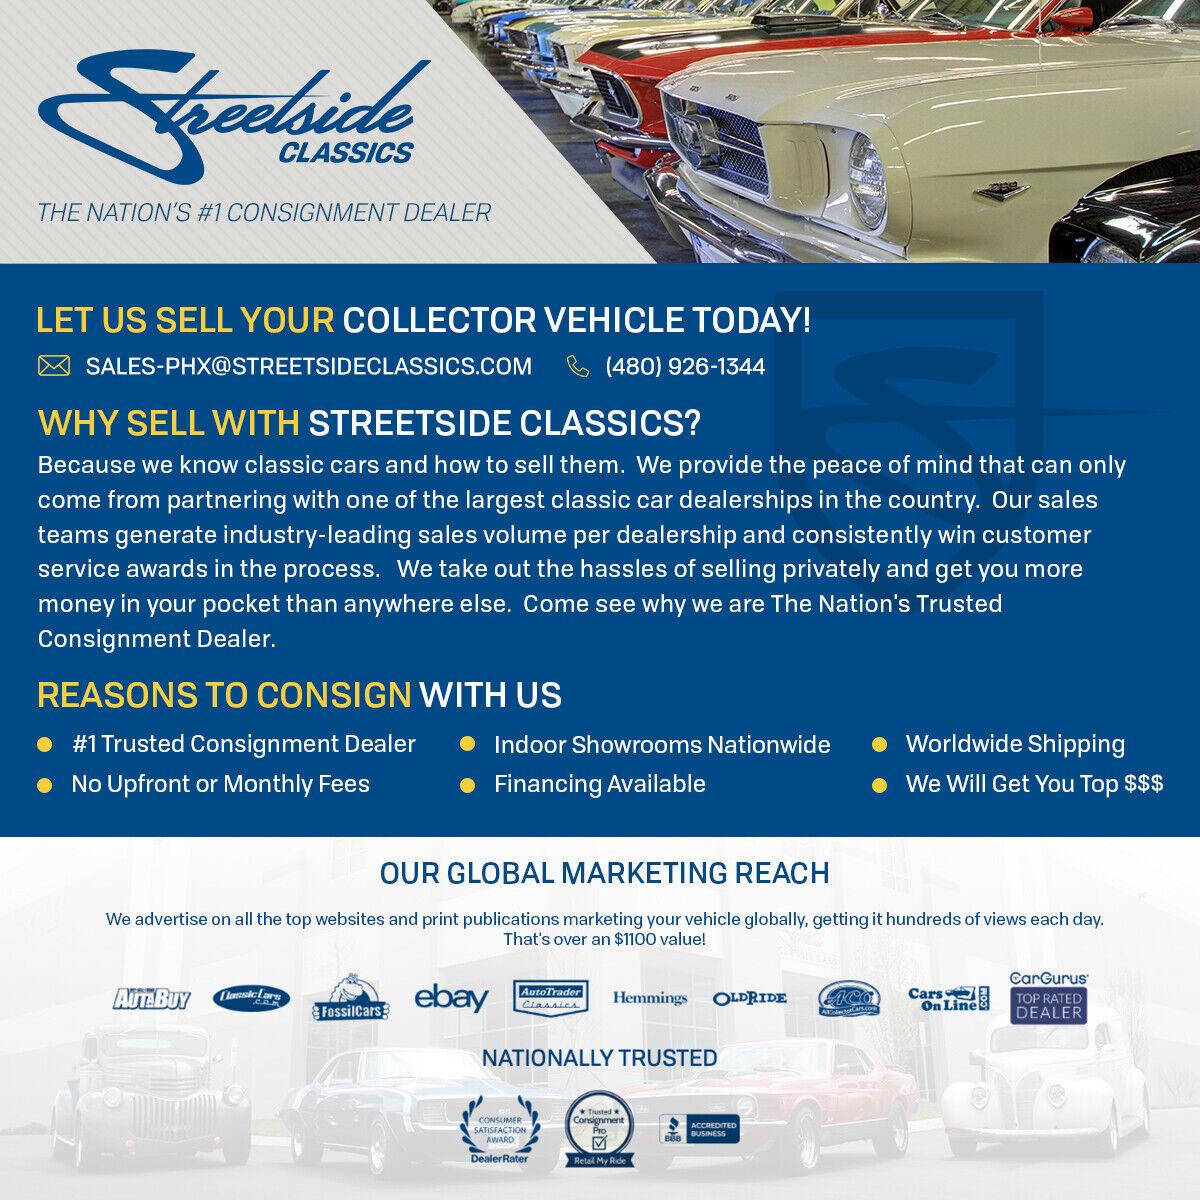 V8 Stroker Auto Classic Vintage Collector Boyd Coddington Pink Comp JE